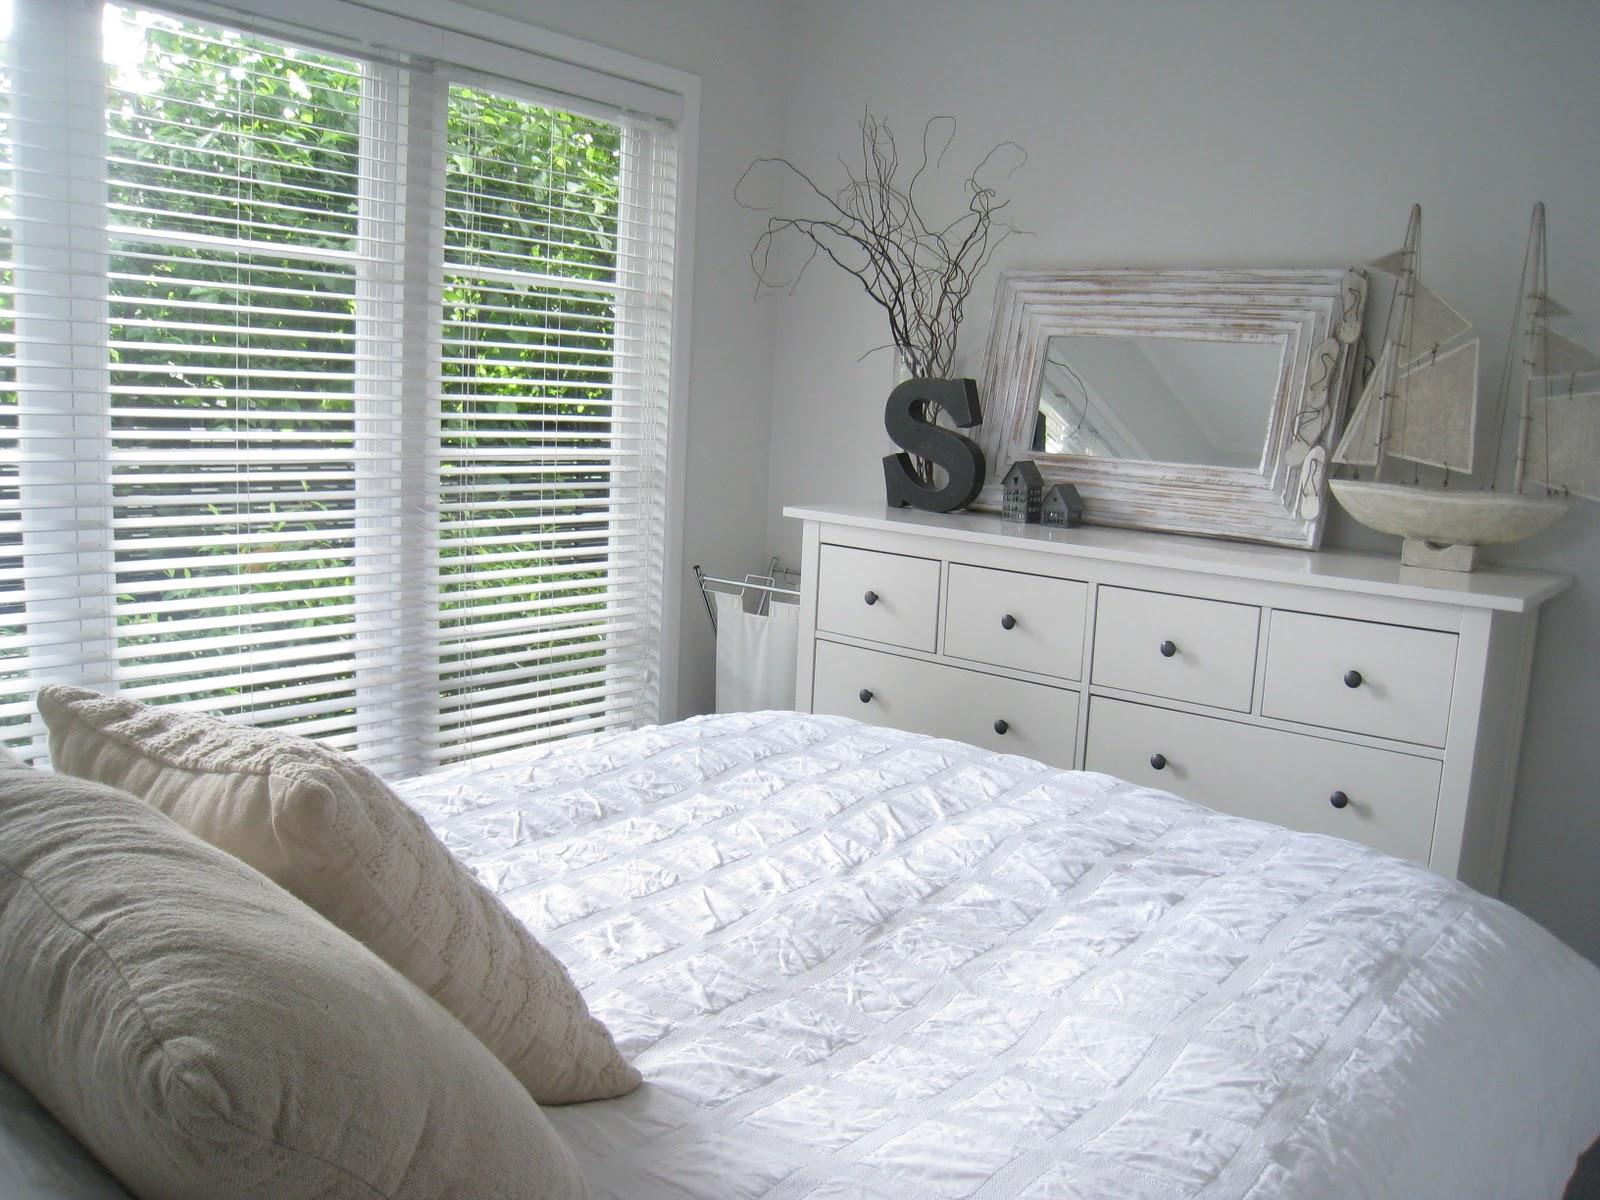 ikea hemnes bedroom furniture photo - 5